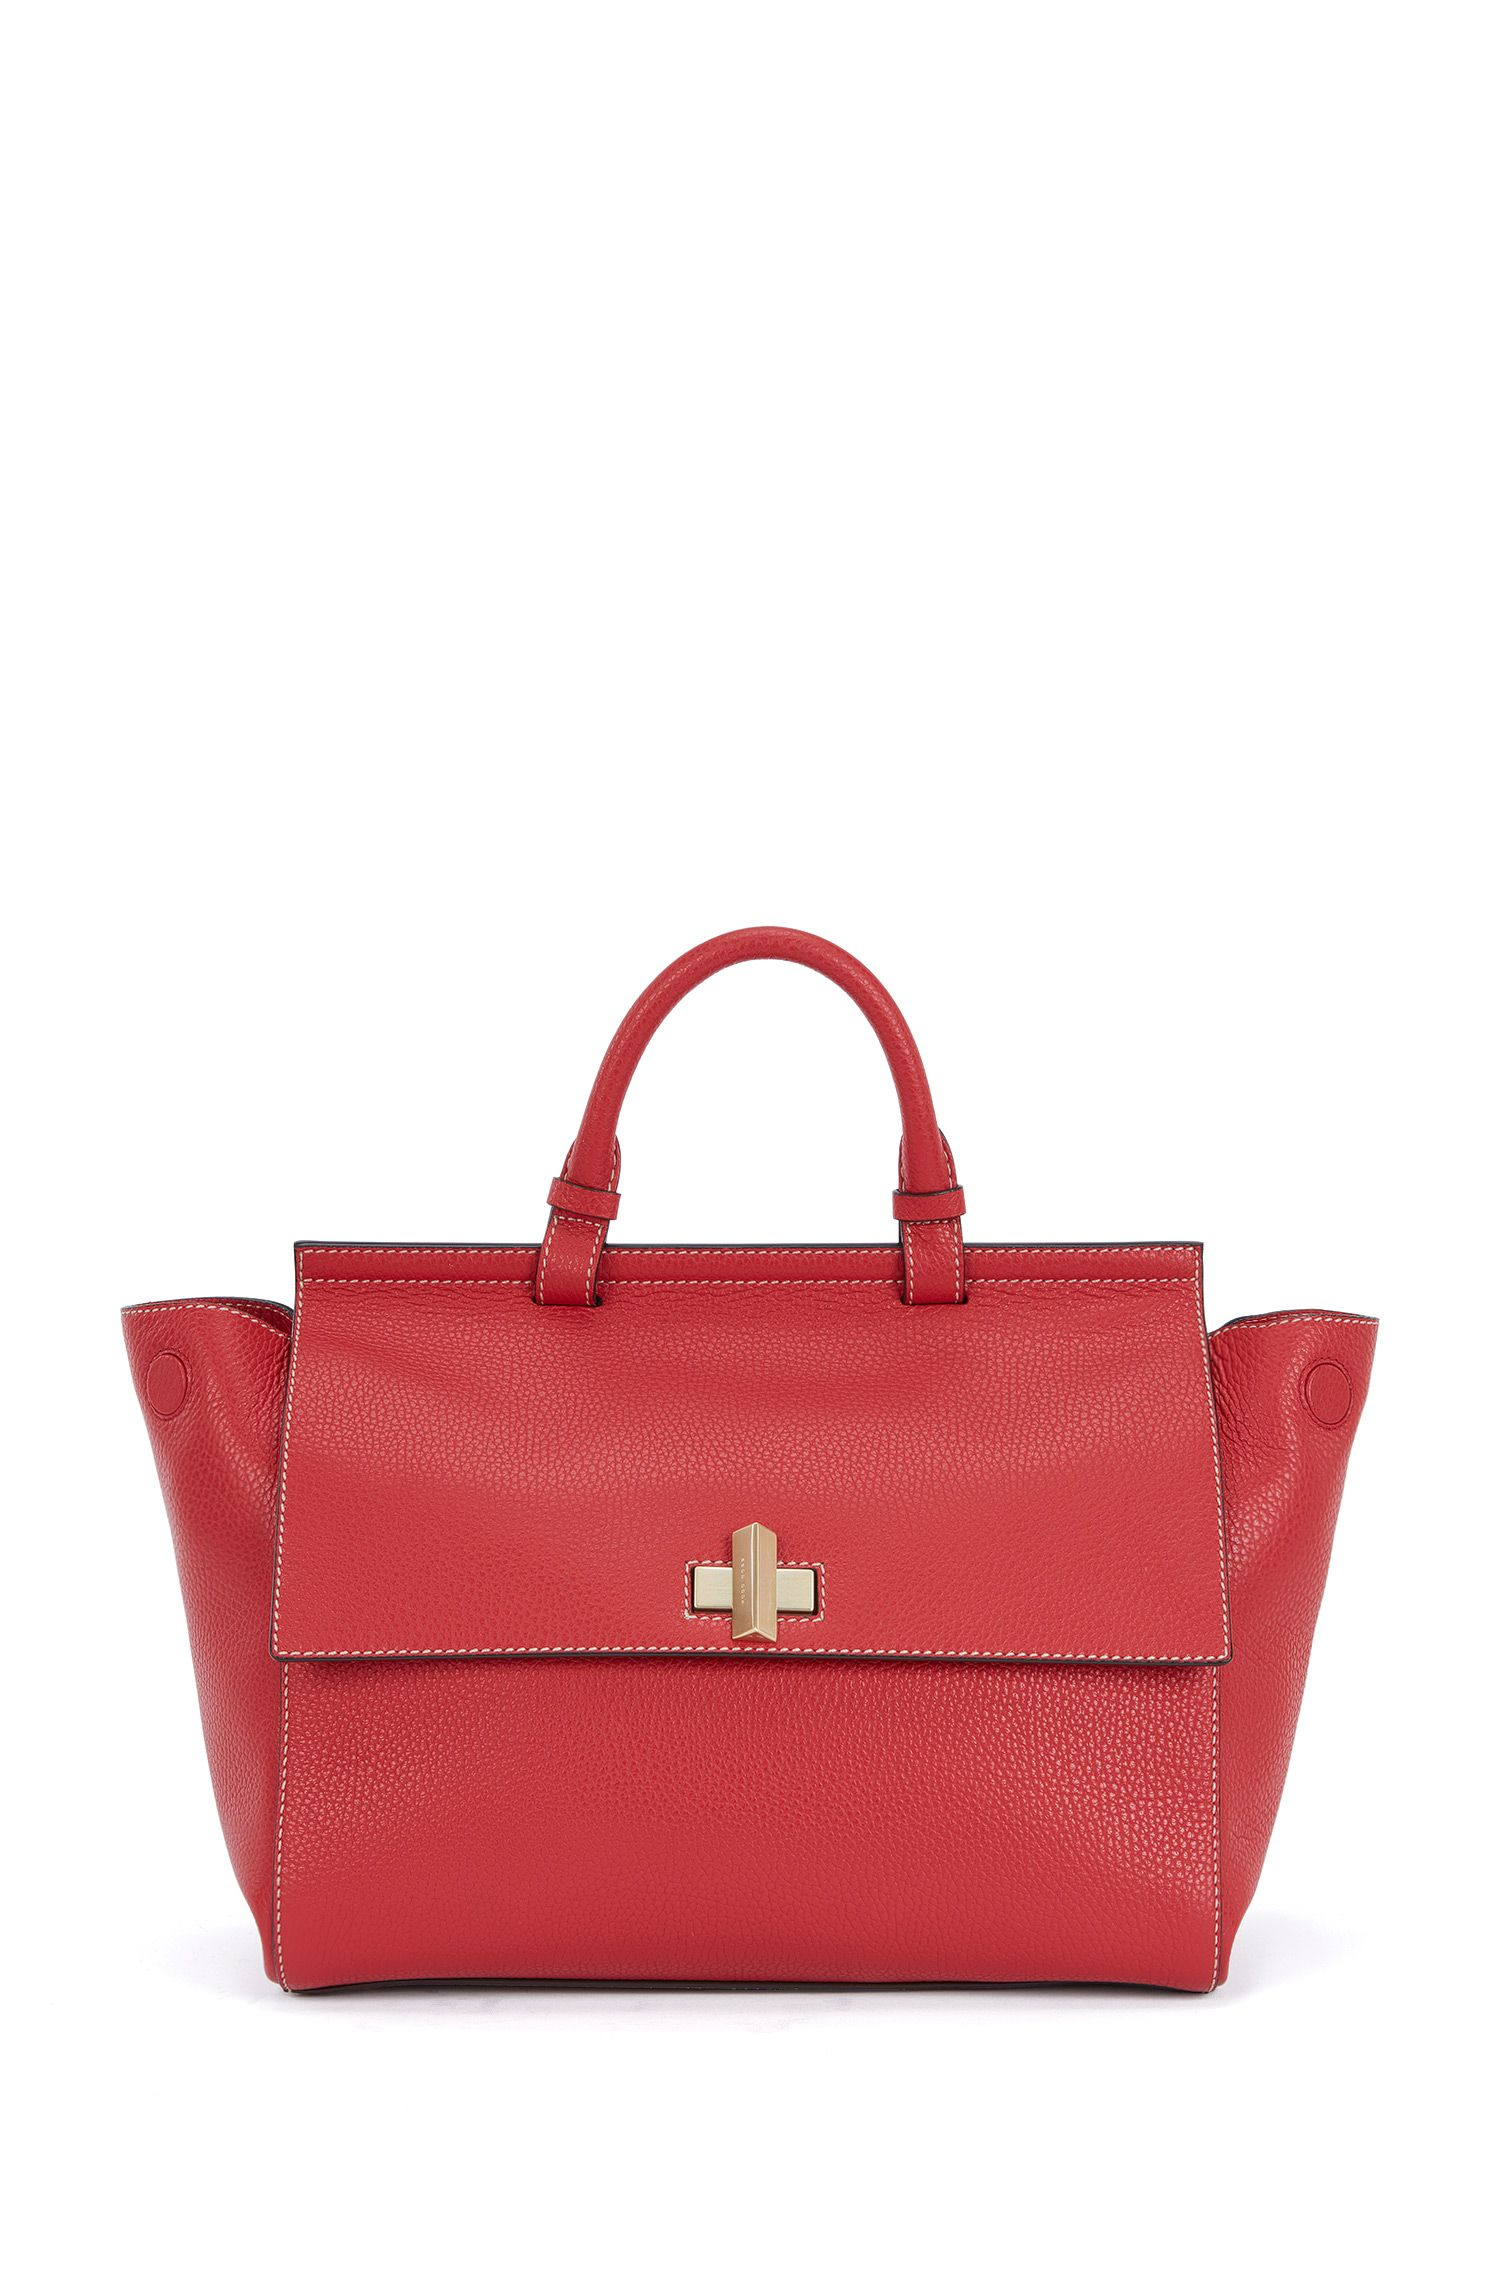 'BOSS Bespoke Soft M' | Leather Grained Satchel Handbag